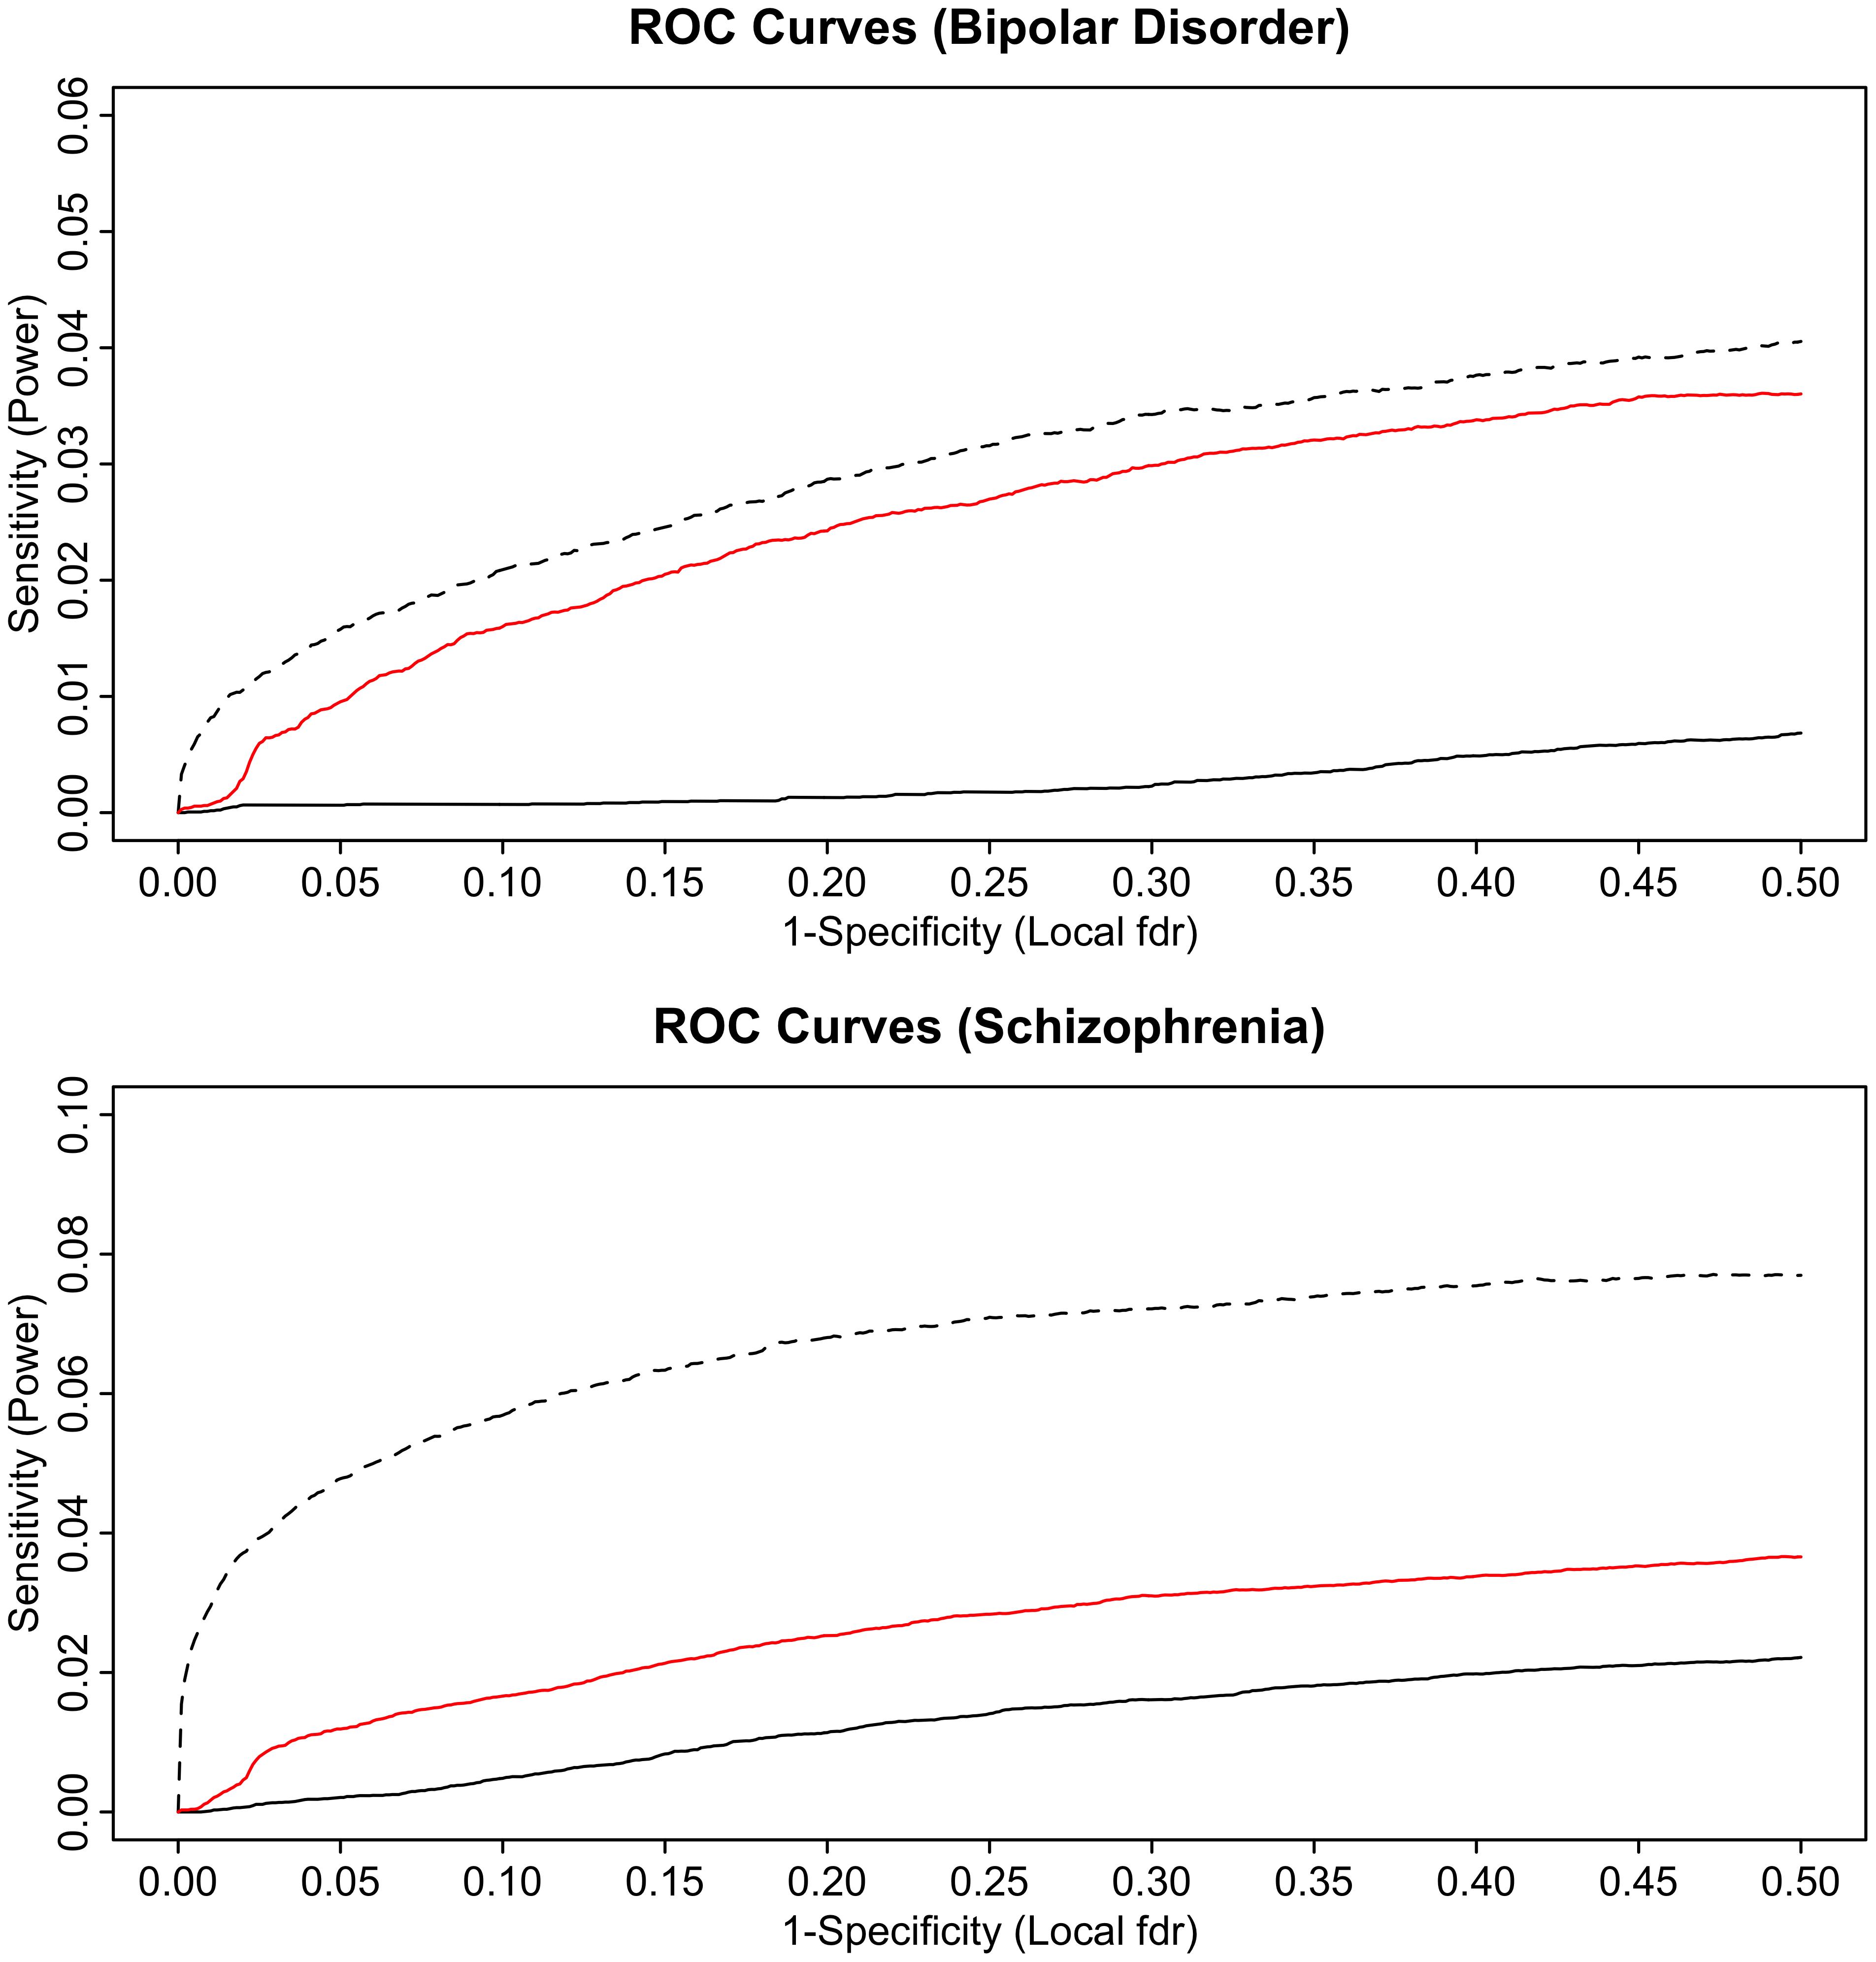 ROC curves for bipolar disorder (top) and schizophrenia (bottom).